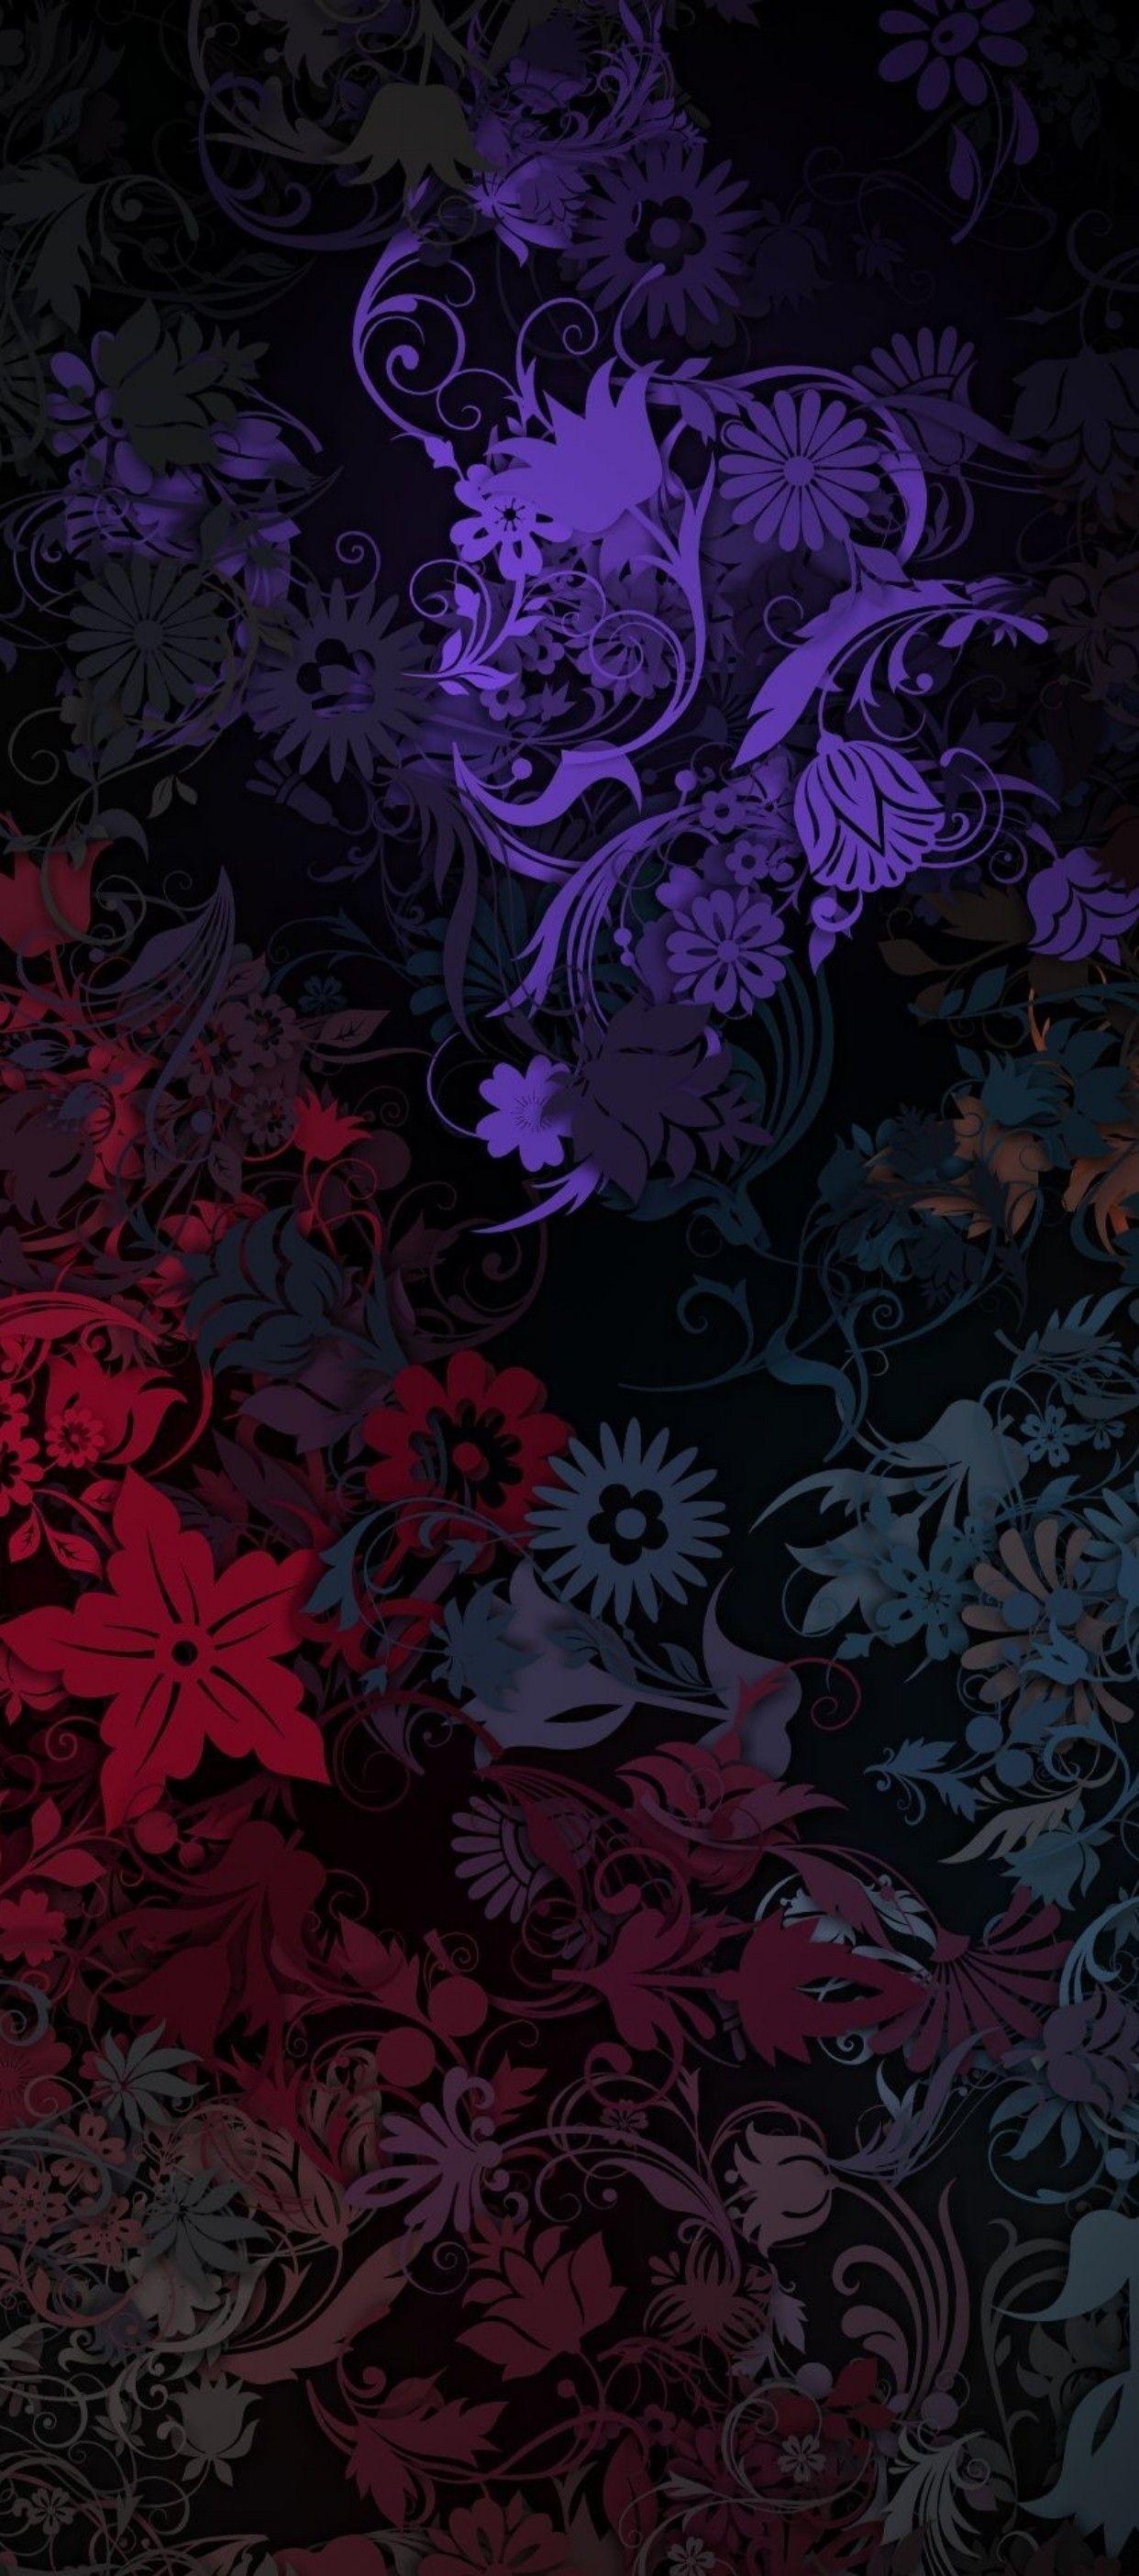 Dark abstract iphone x wallpaper more at https